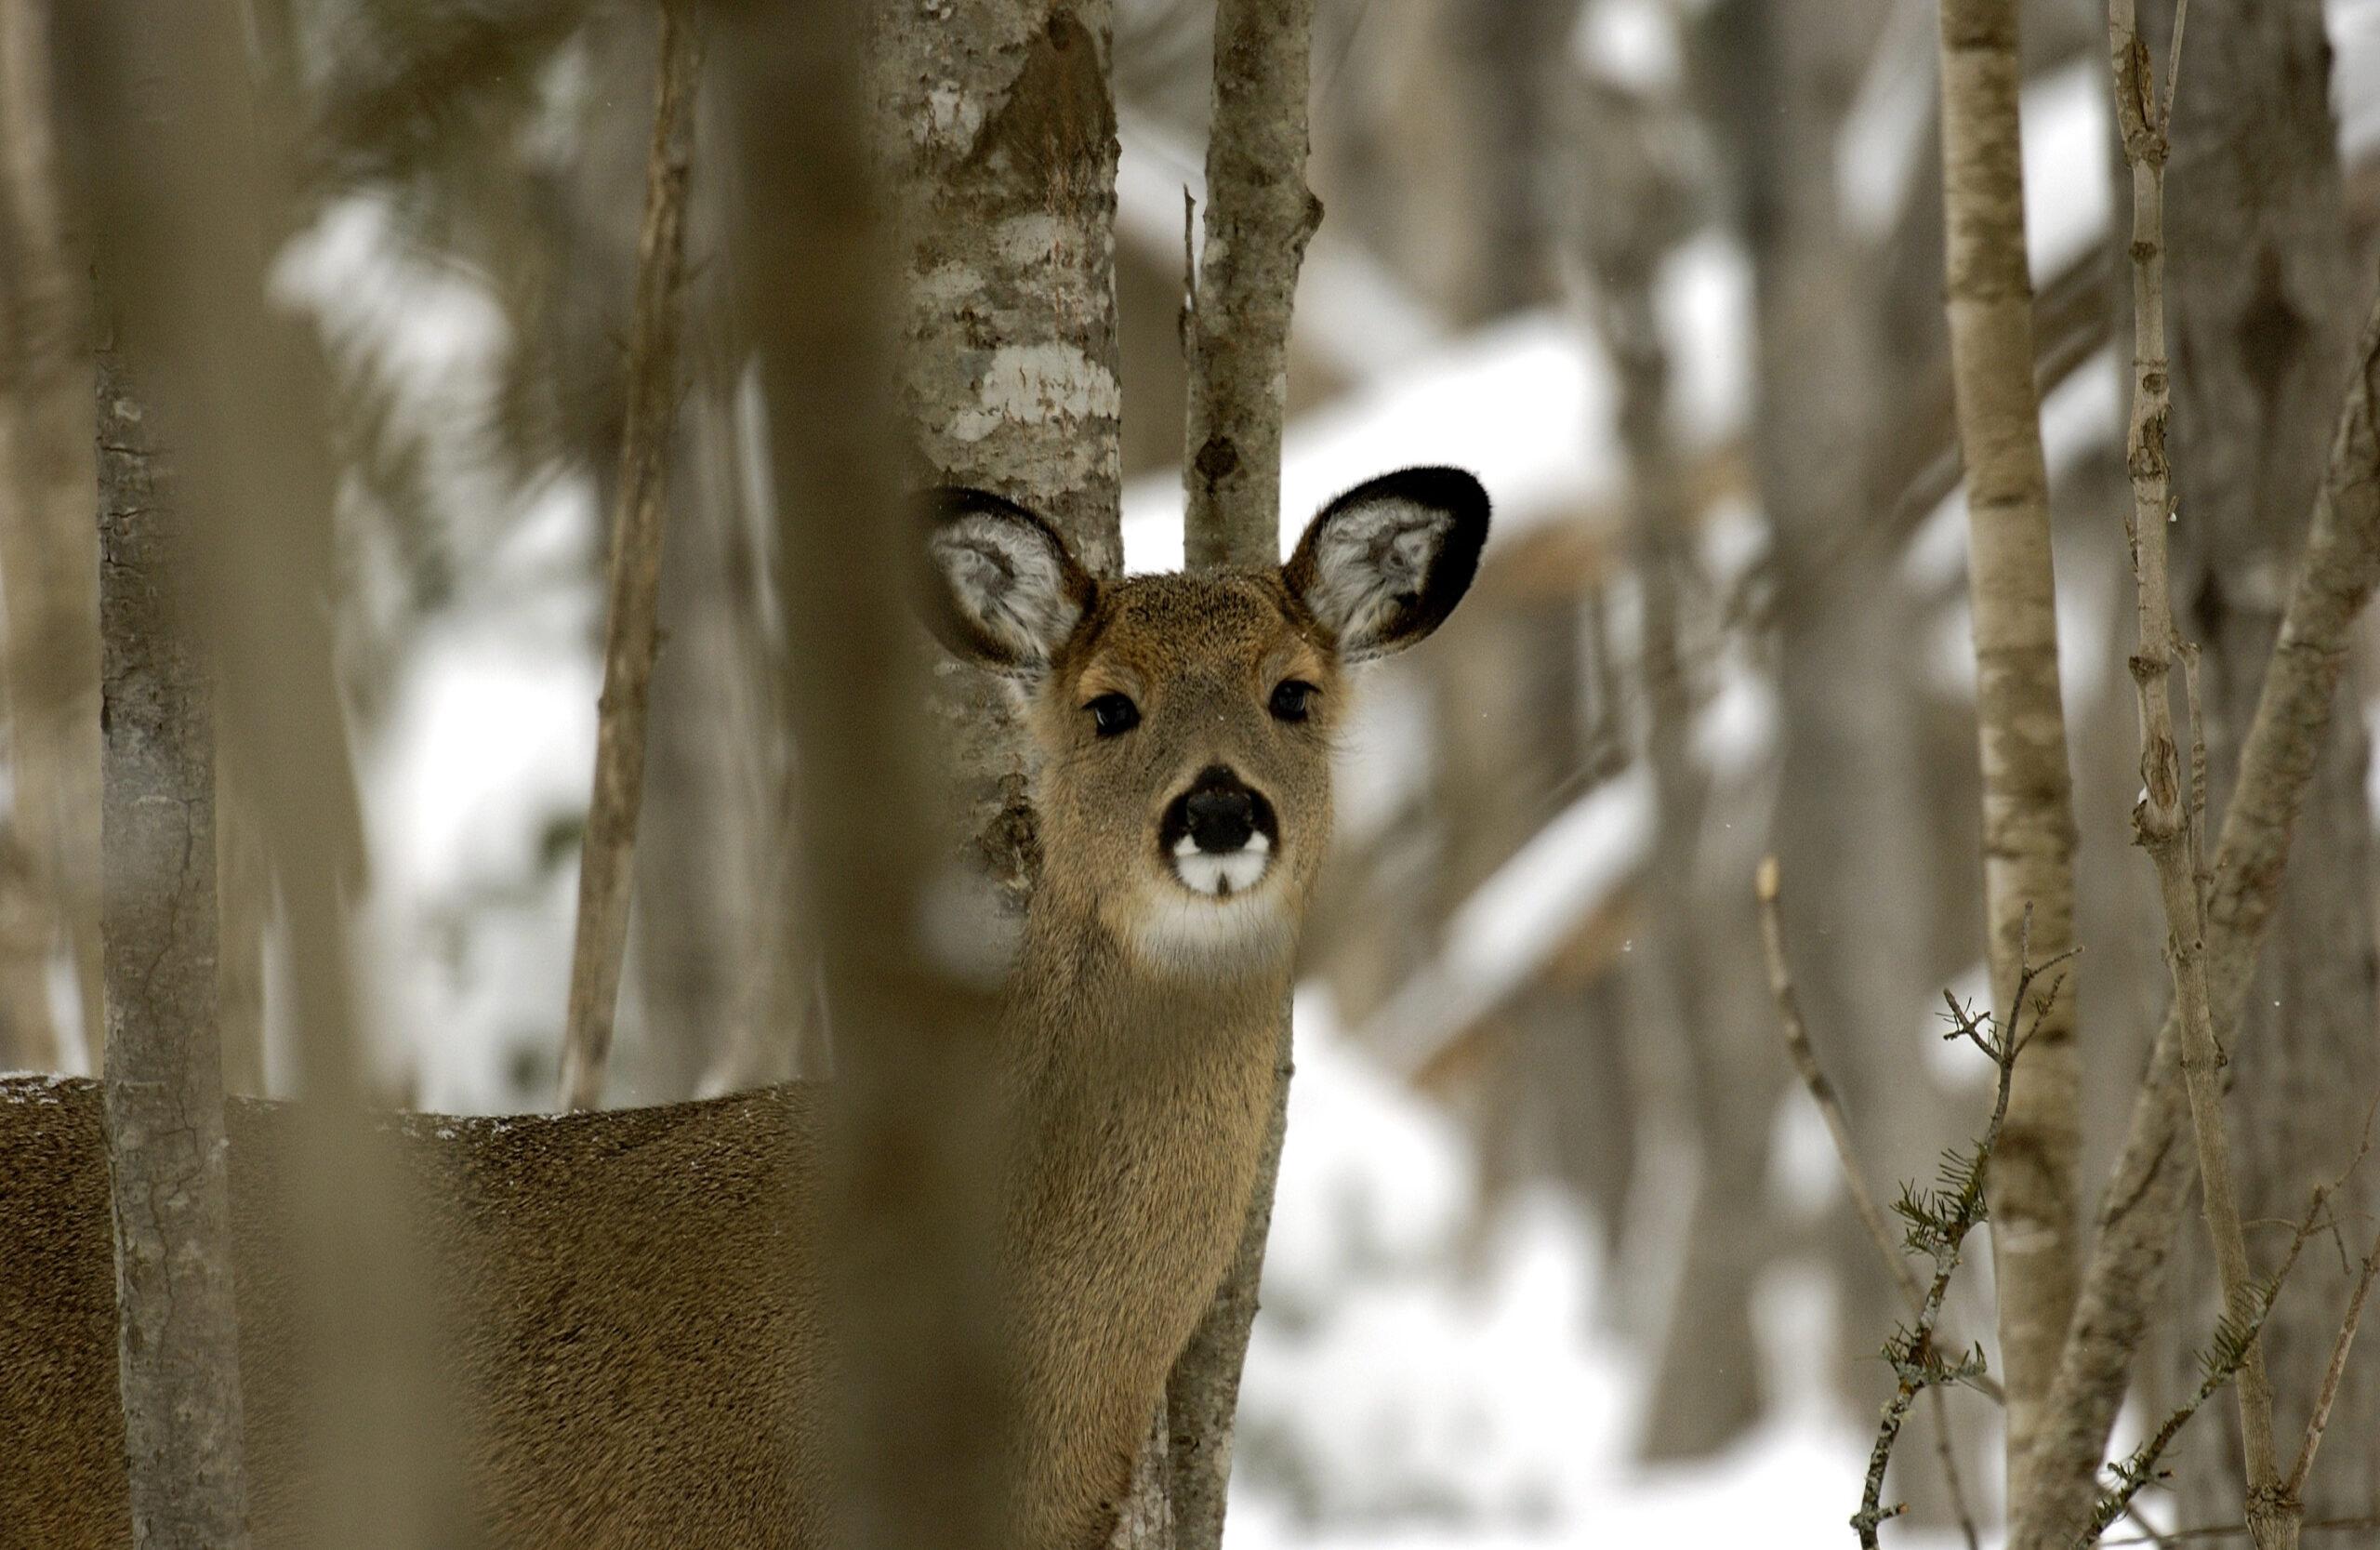 Dnr Offering Discount On Deer Licenses For Hunting In 6 inside Michigan Deer Season 2021